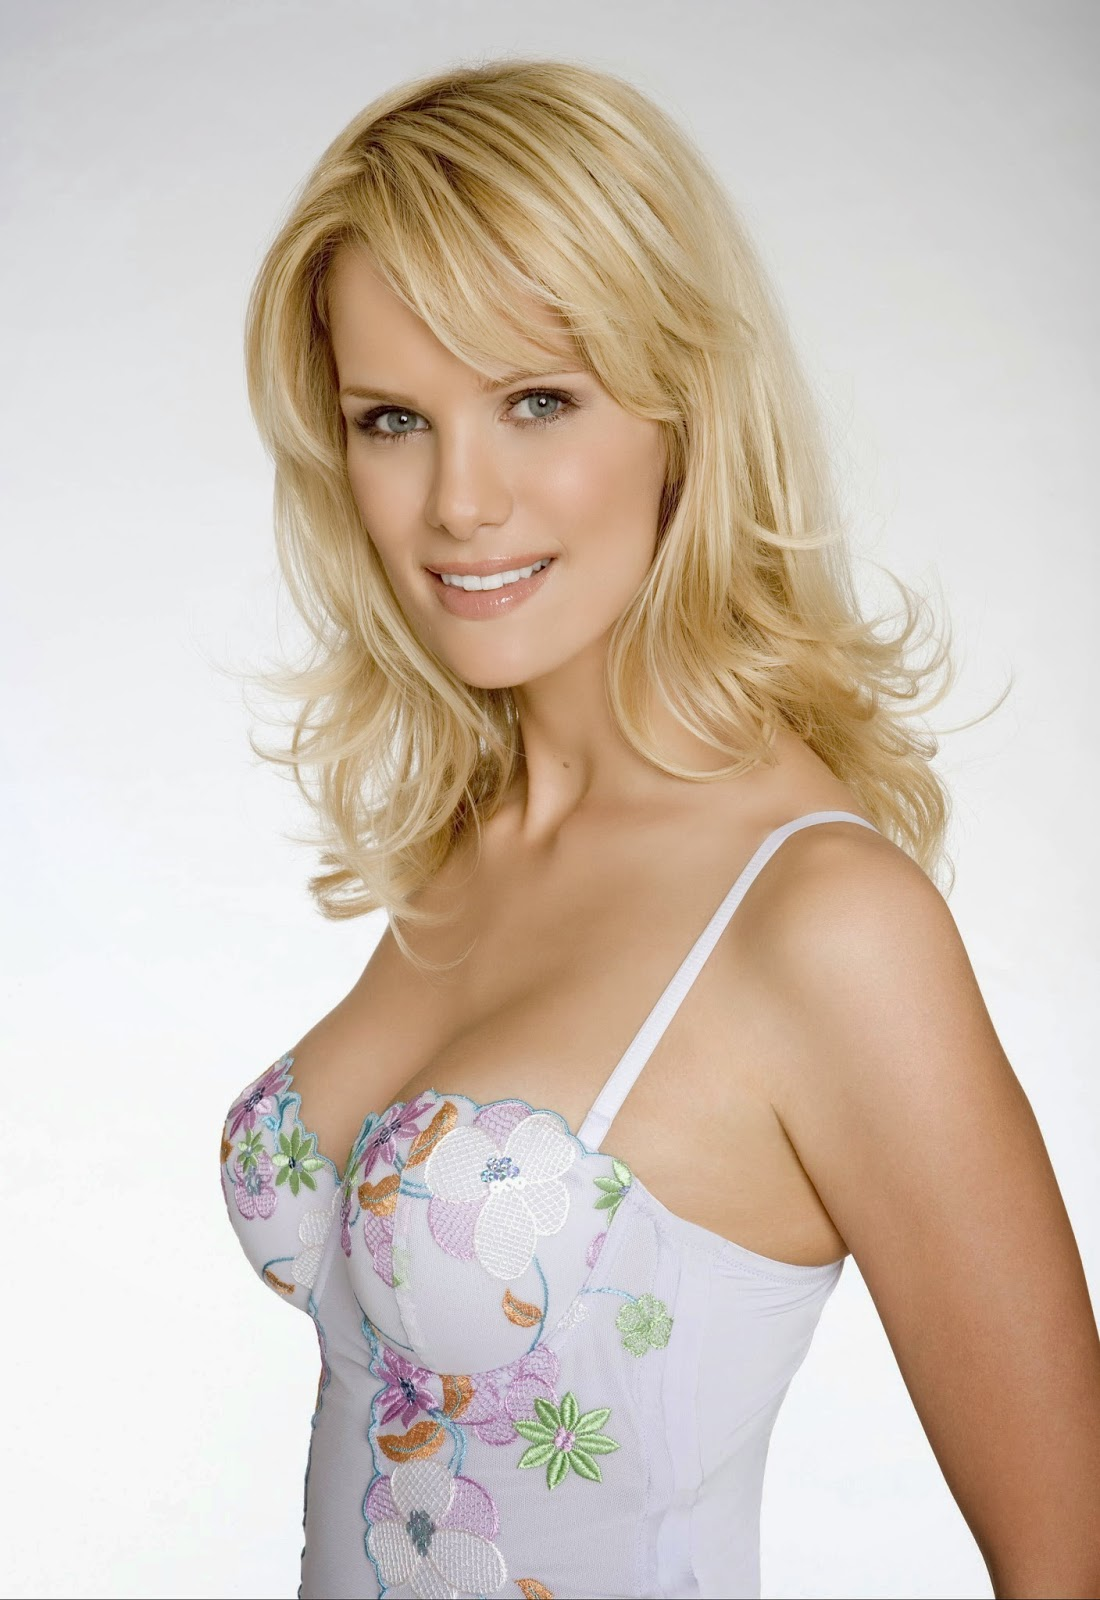 BP: The Top 10 Hottest German Women